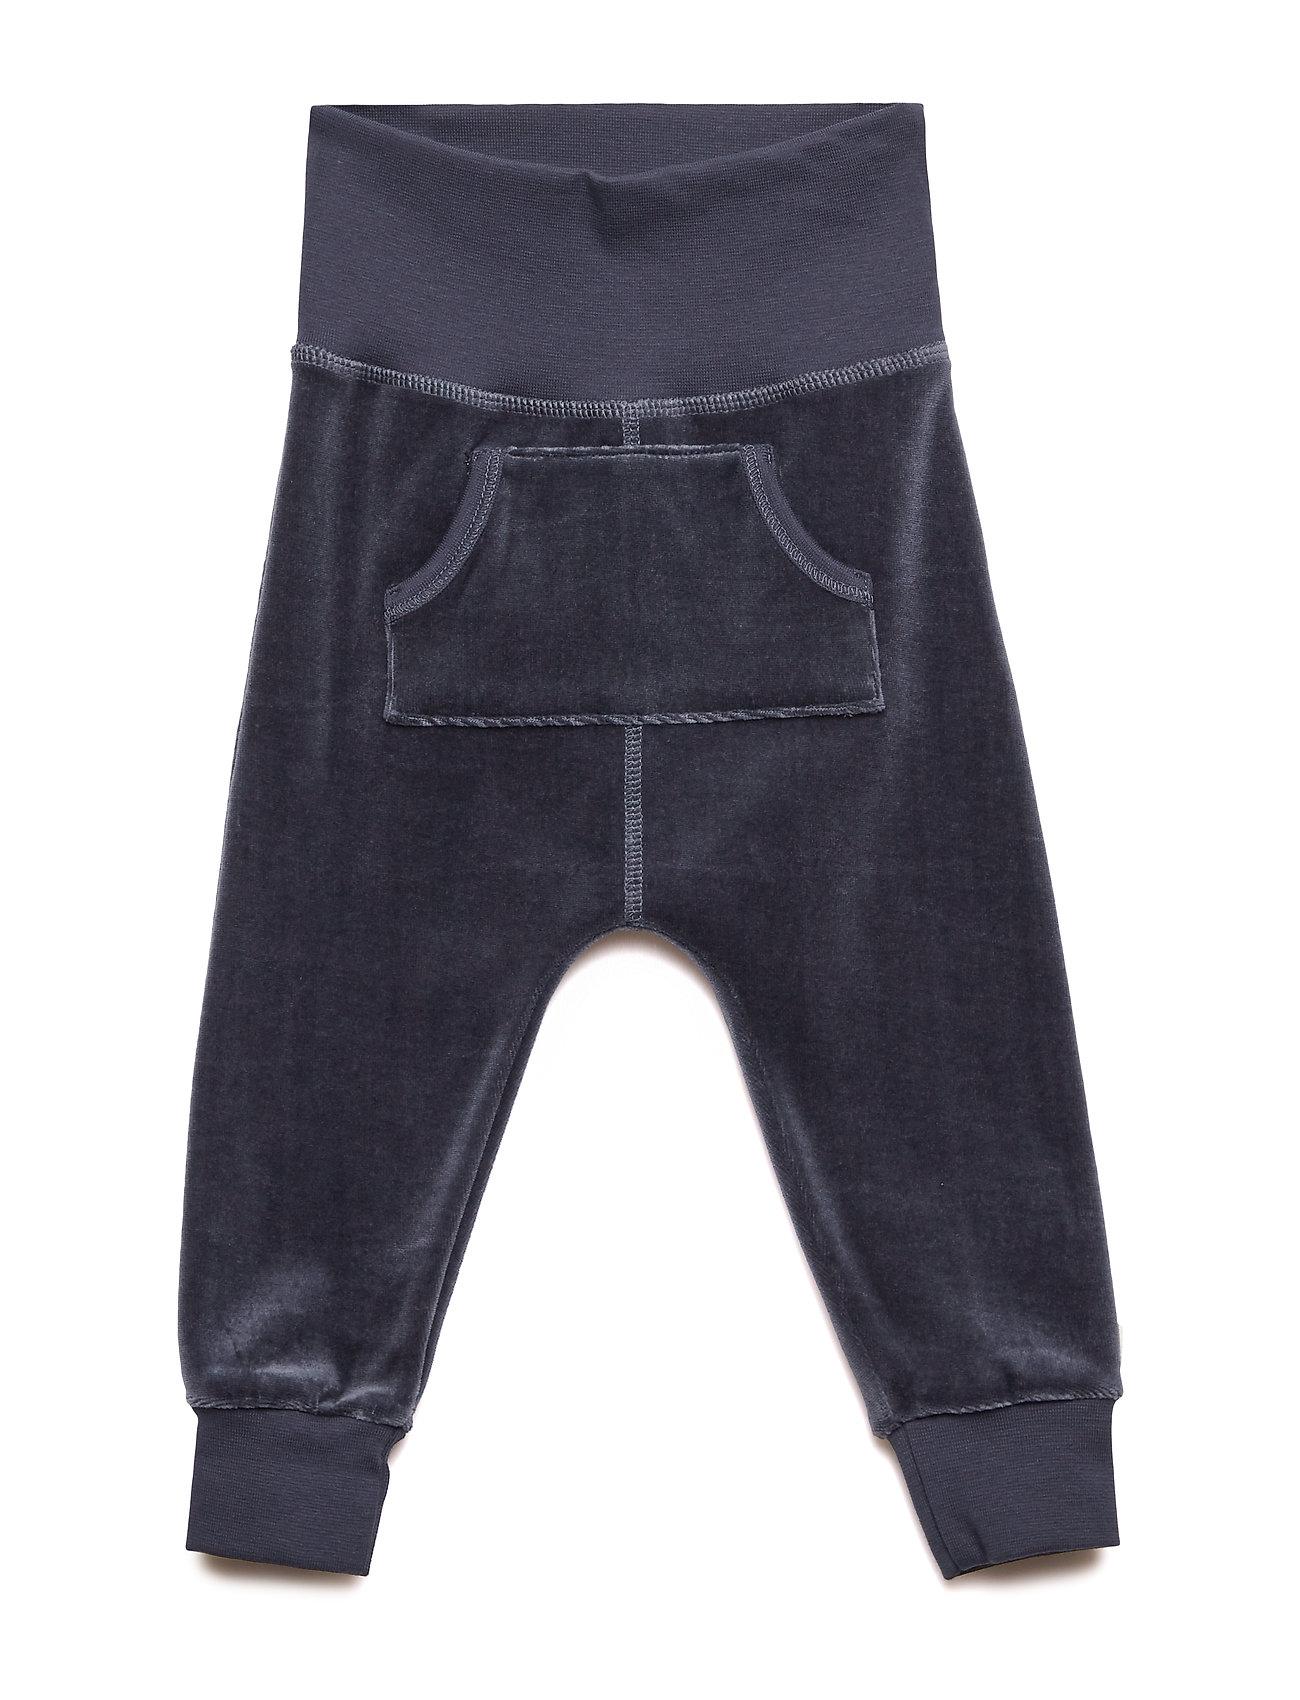 1693d6b6 Velvet Pocket Pants (Midnight) (209.30 kr) - Müsli by Green Cotton ...